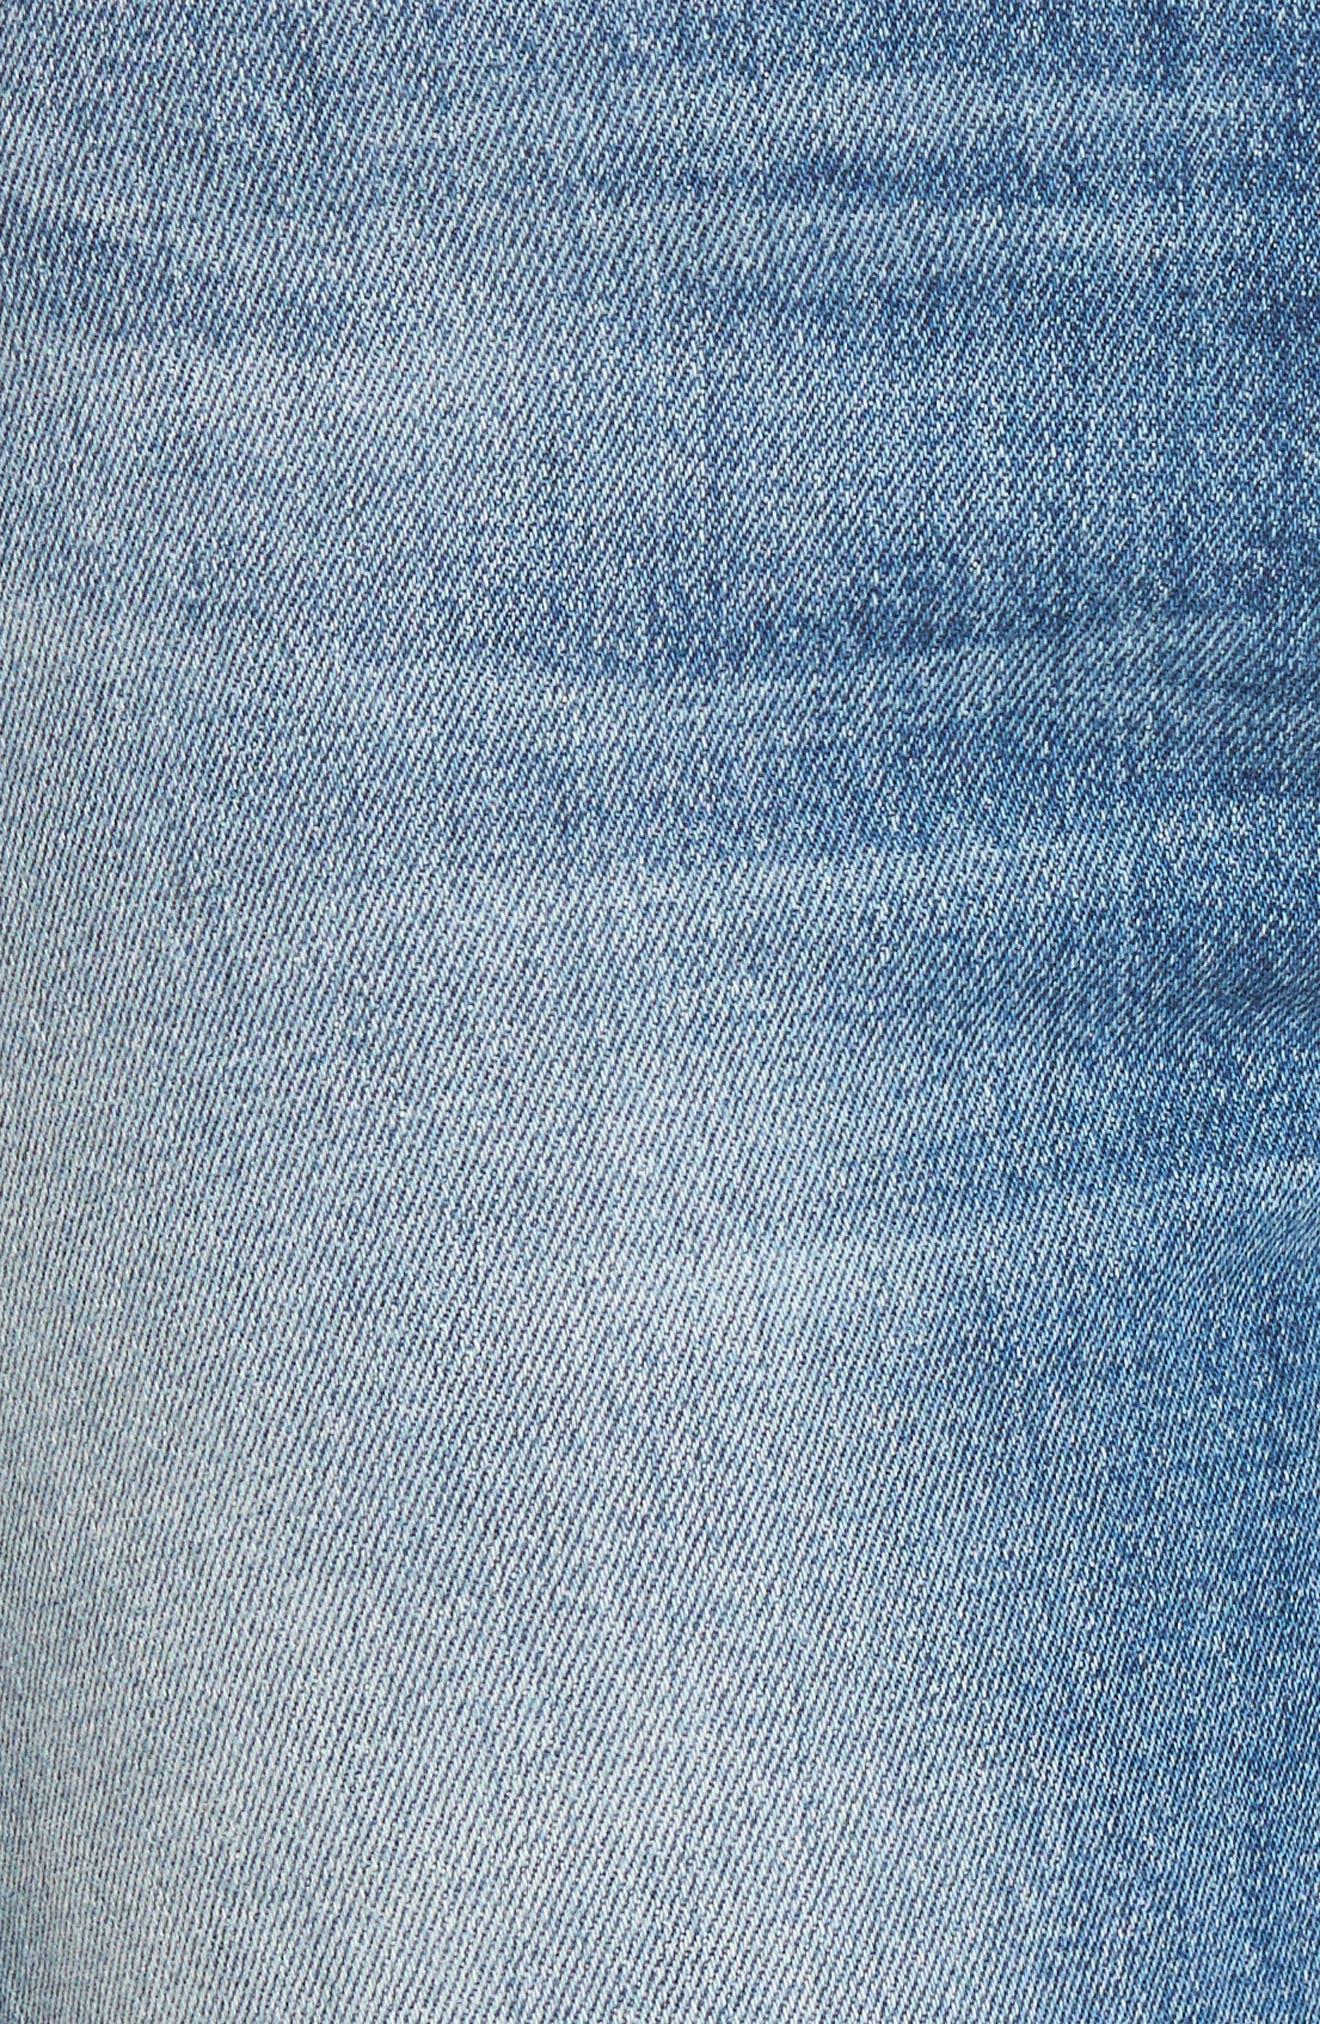 Zoeey High Waist Crop Straight Leg Jeans,                             Alternate thumbnail 16, color,